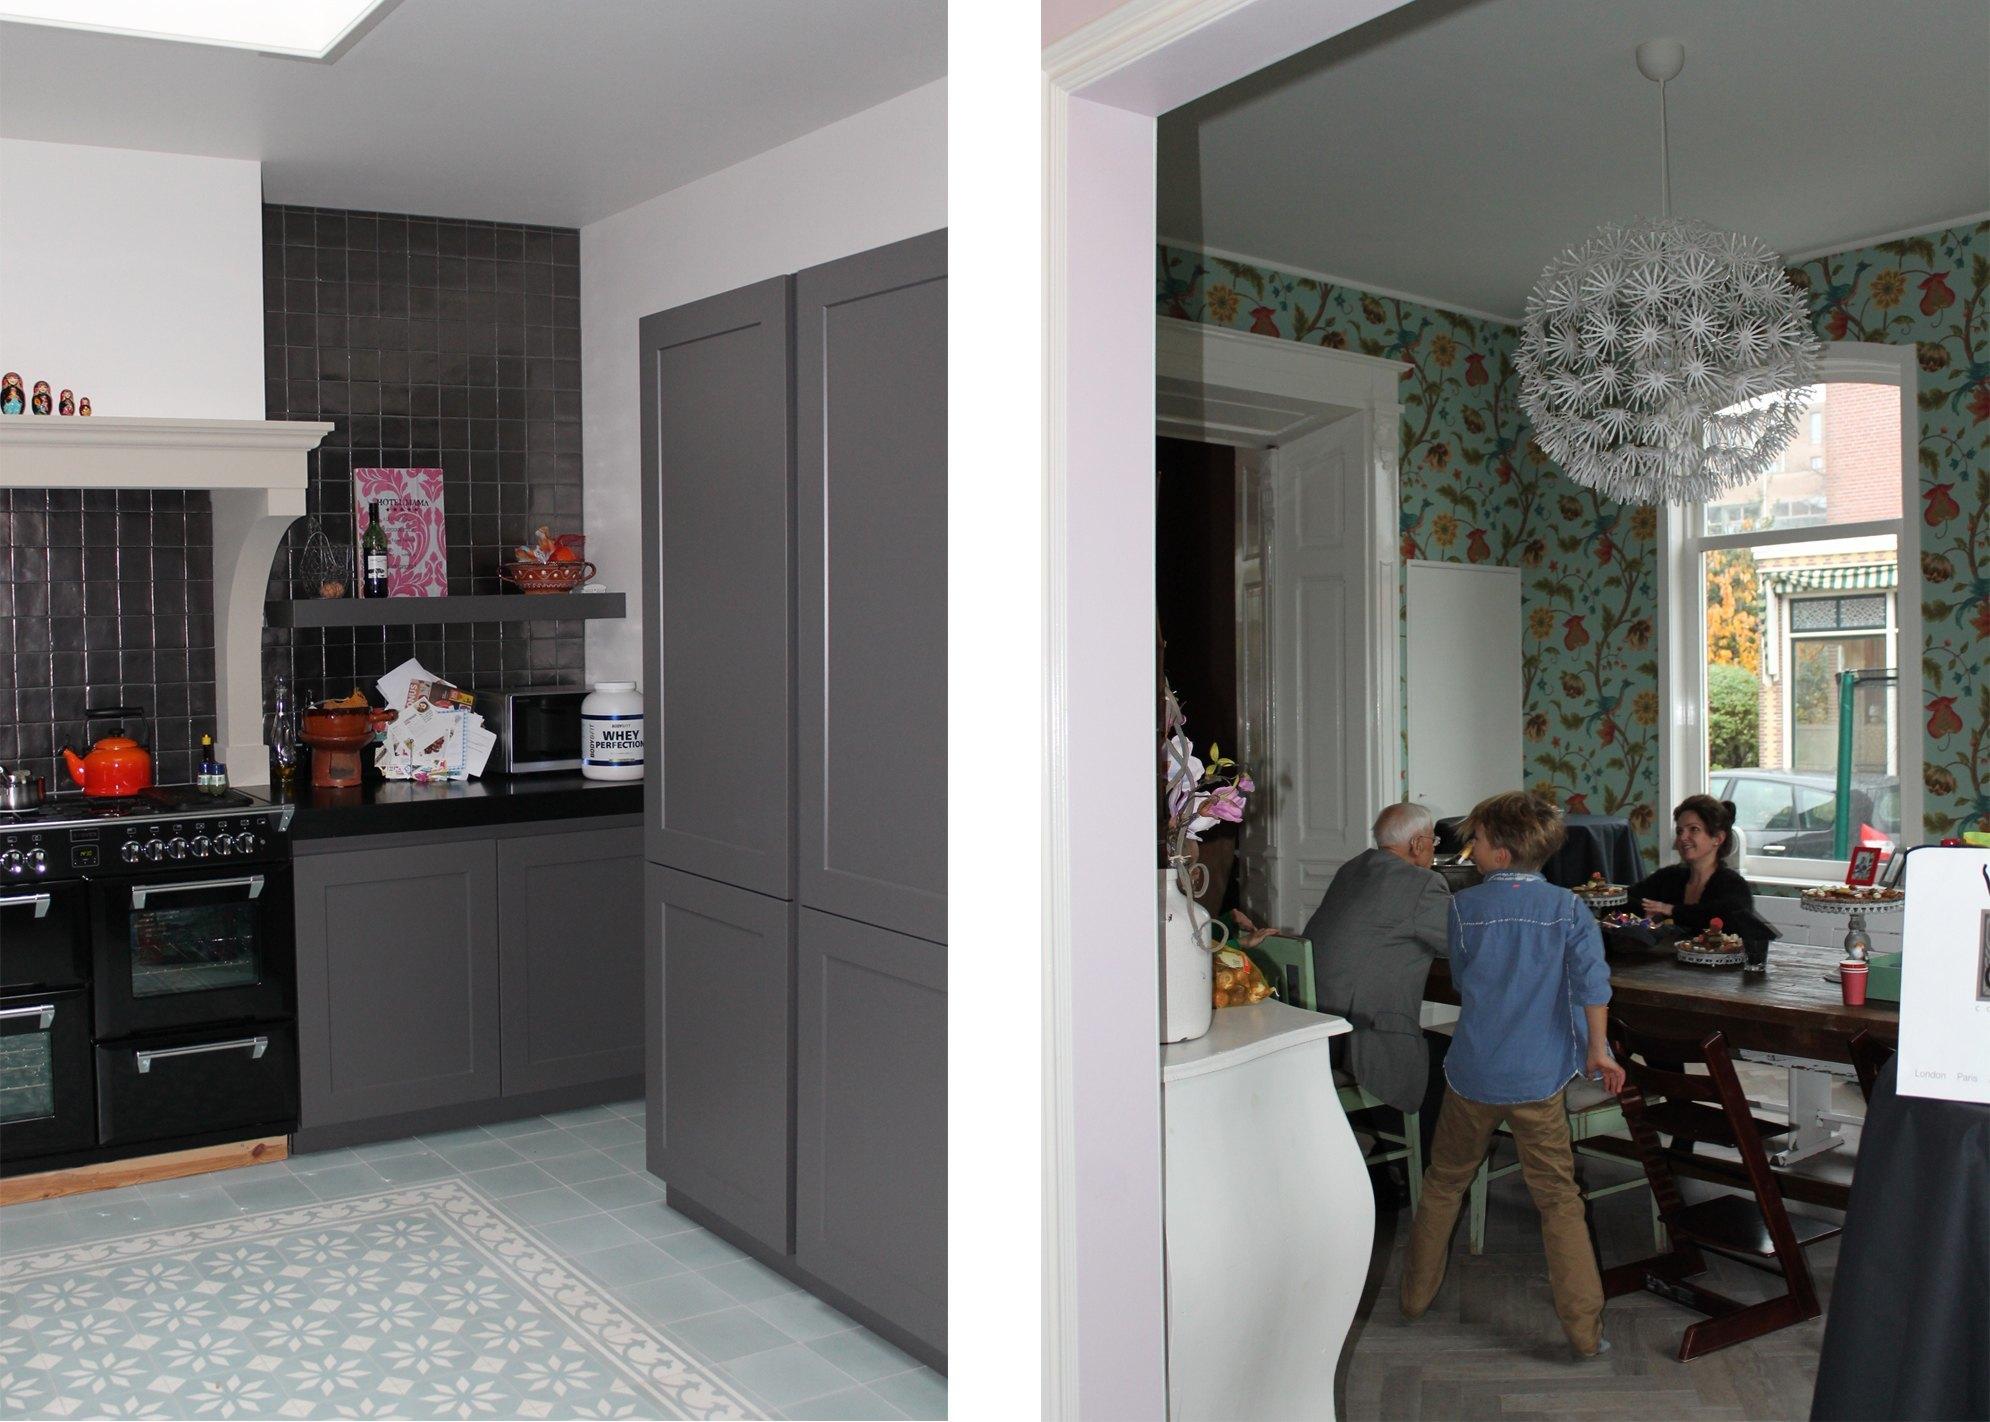 Interieur herenhuis paola paez - Keuken eetkamer ...